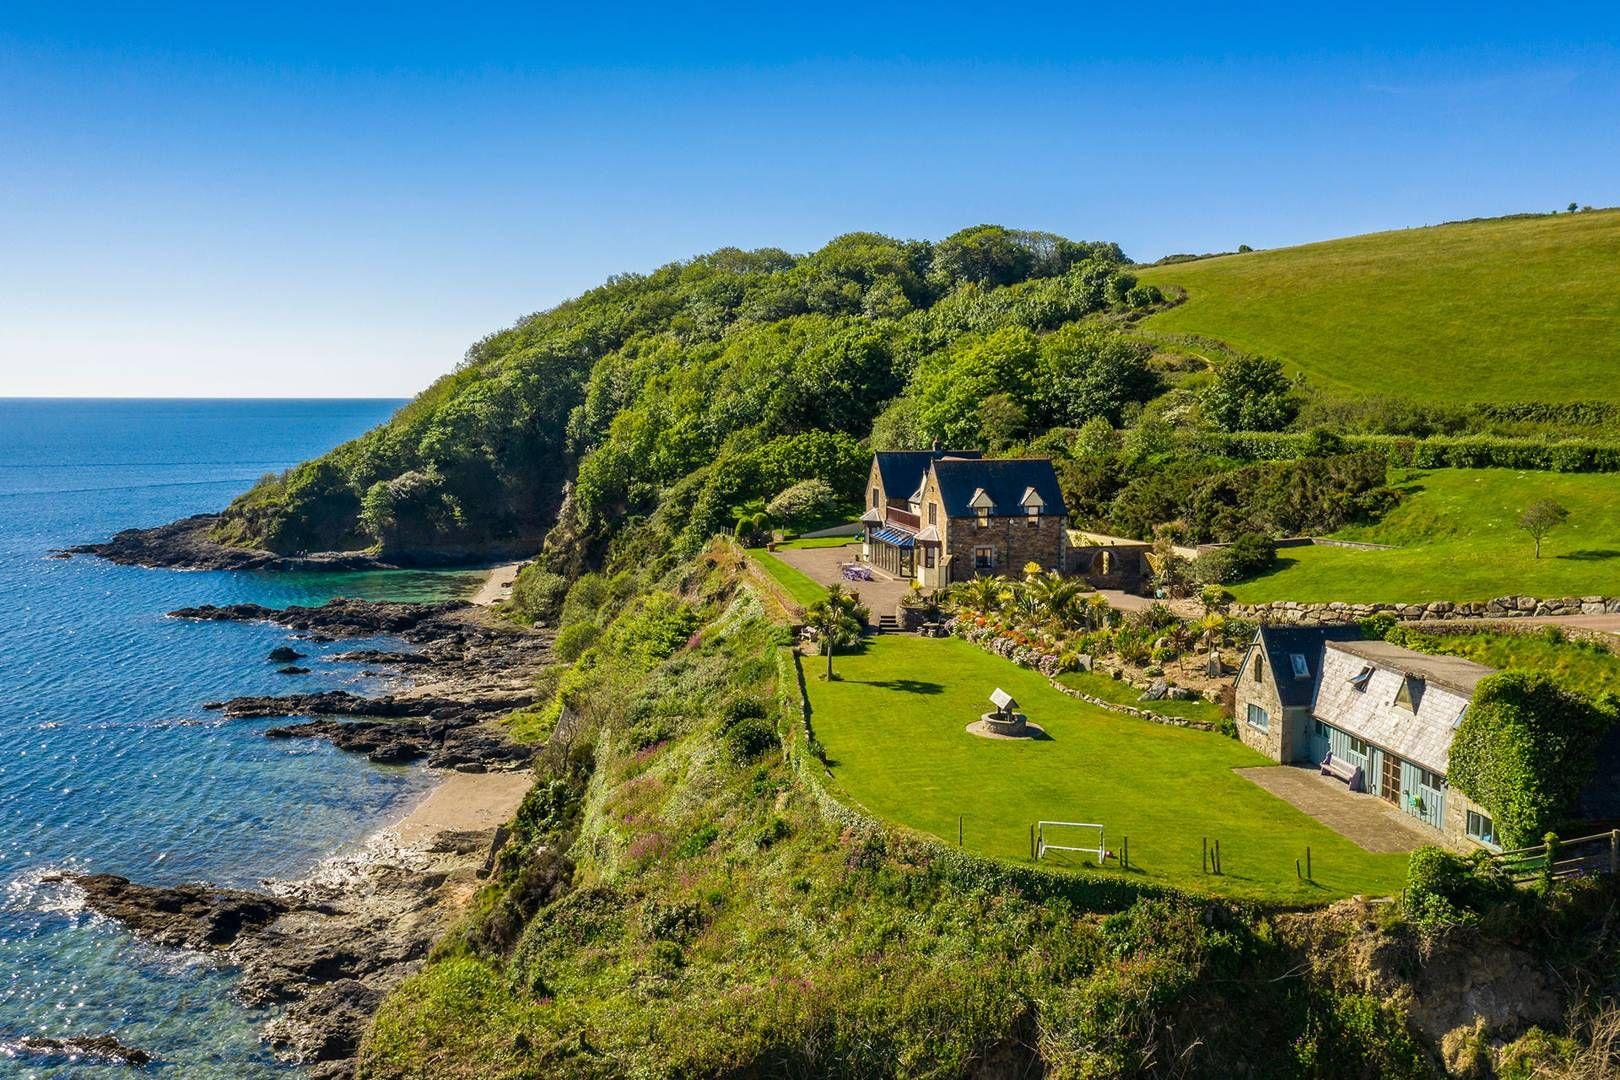 06130f336fd691343896557f12aabce0 - The Coastal Gardener Isle Of Wight